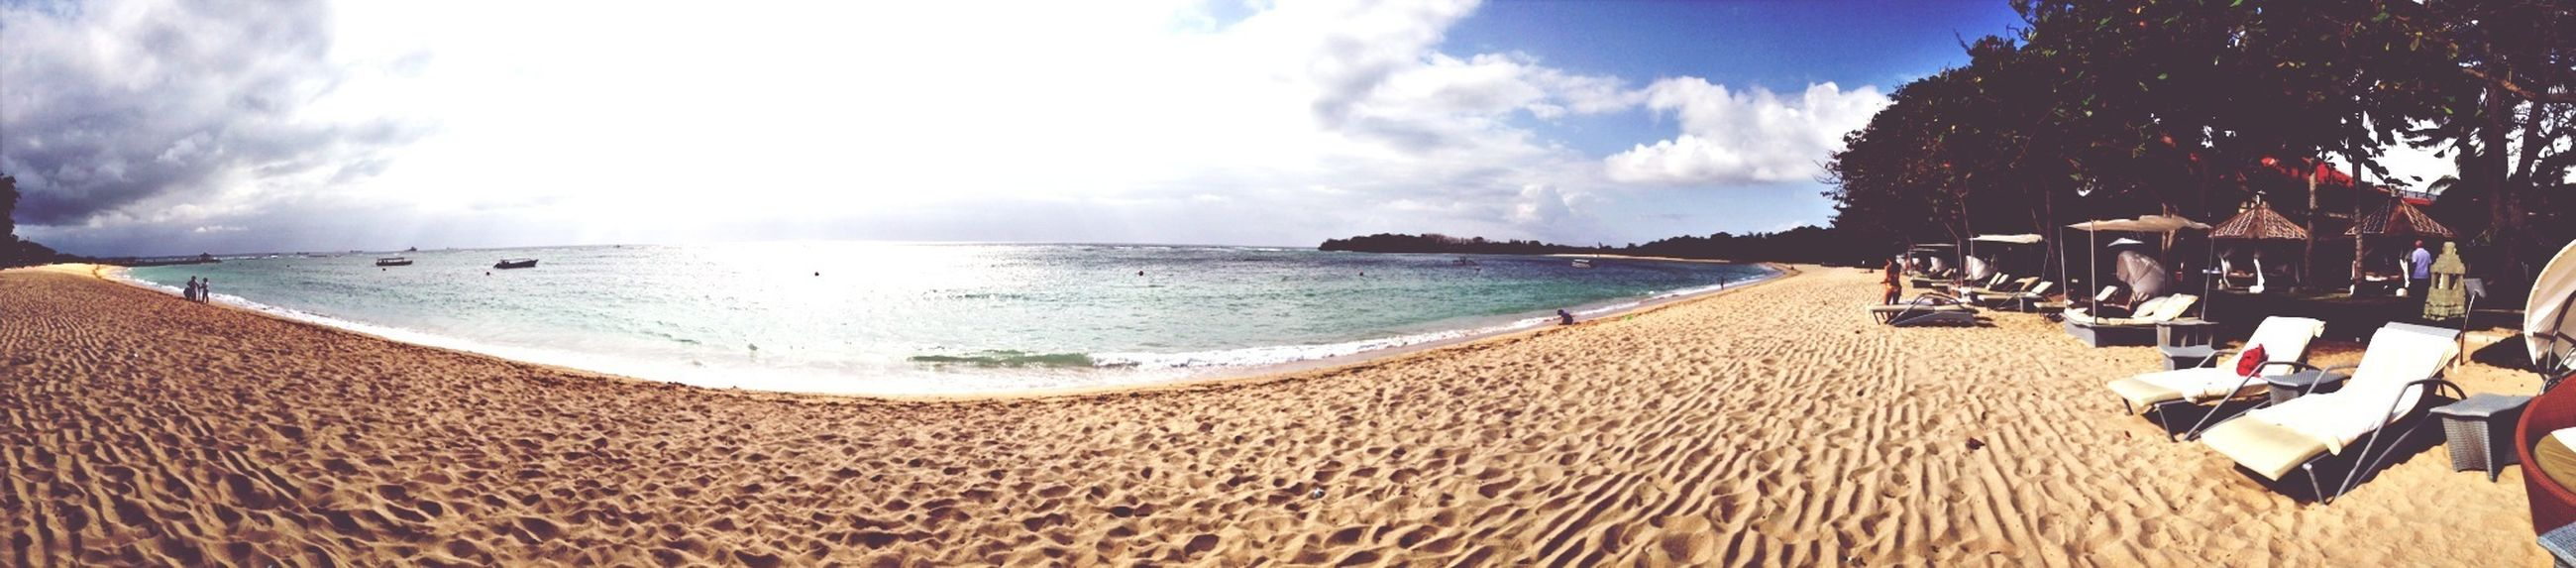 Bali Throwback On The Beach